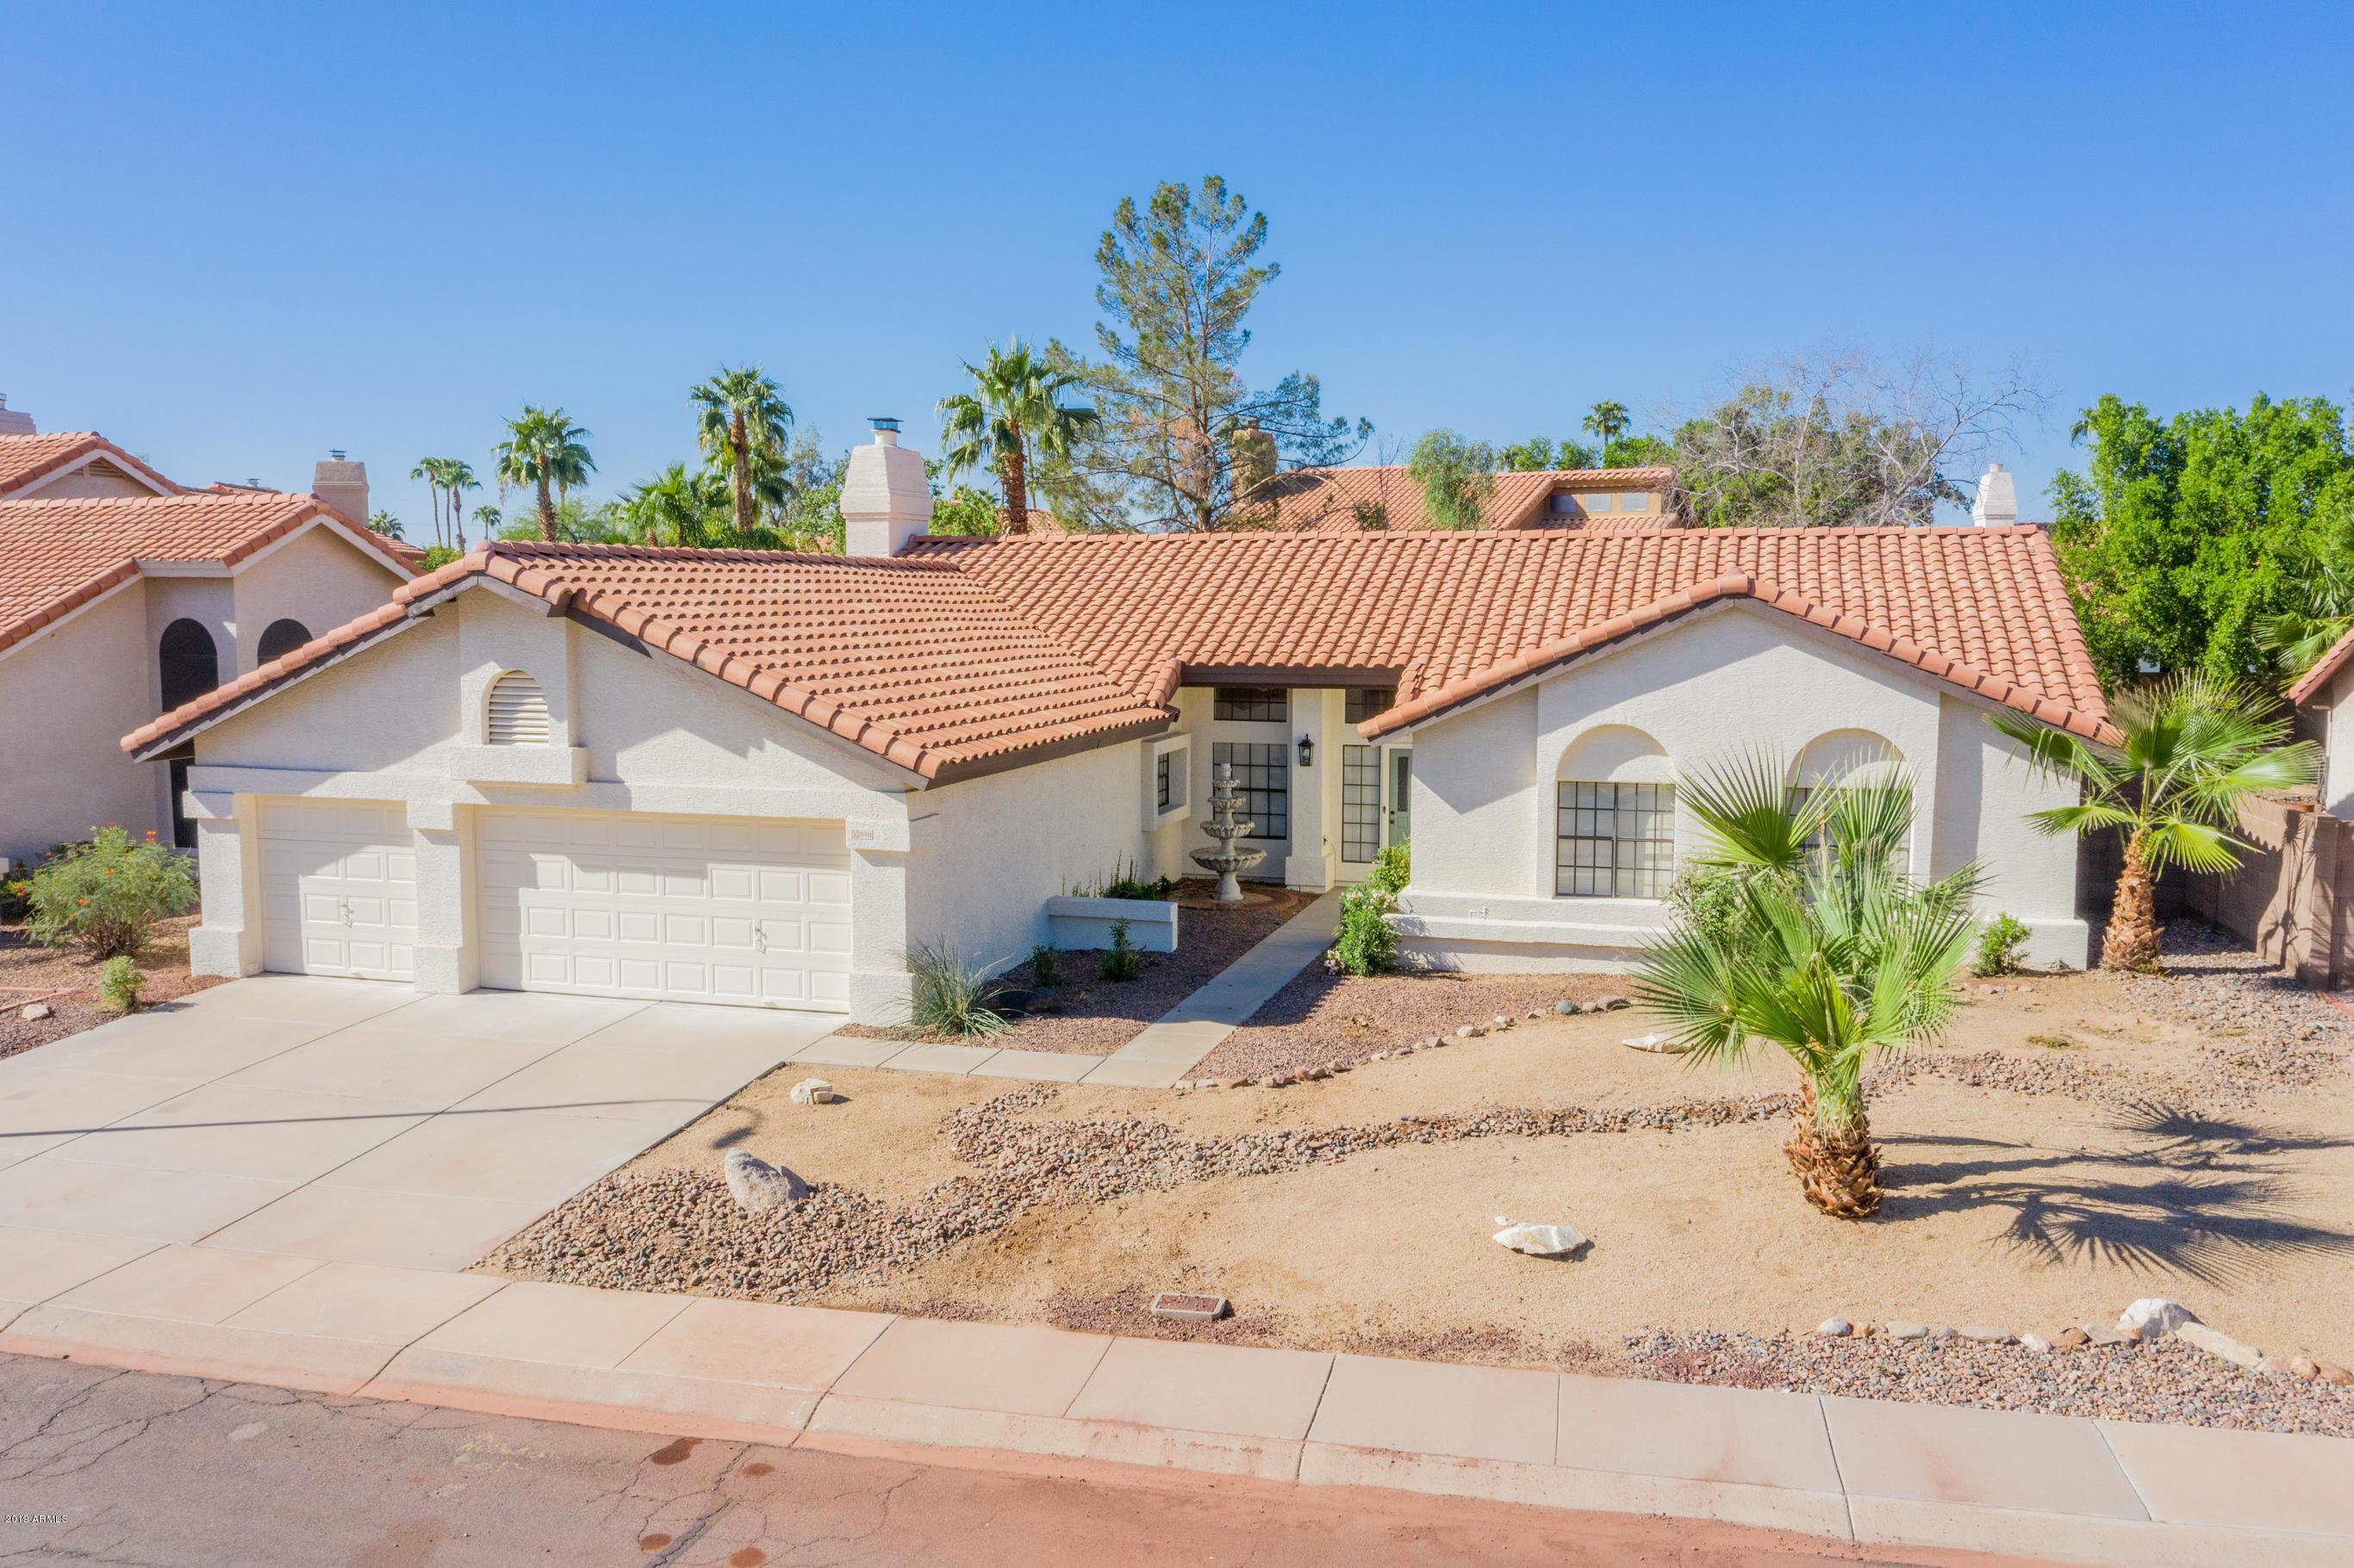 Photo of 16414 S 36TH Street, Phoenix, AZ 85048